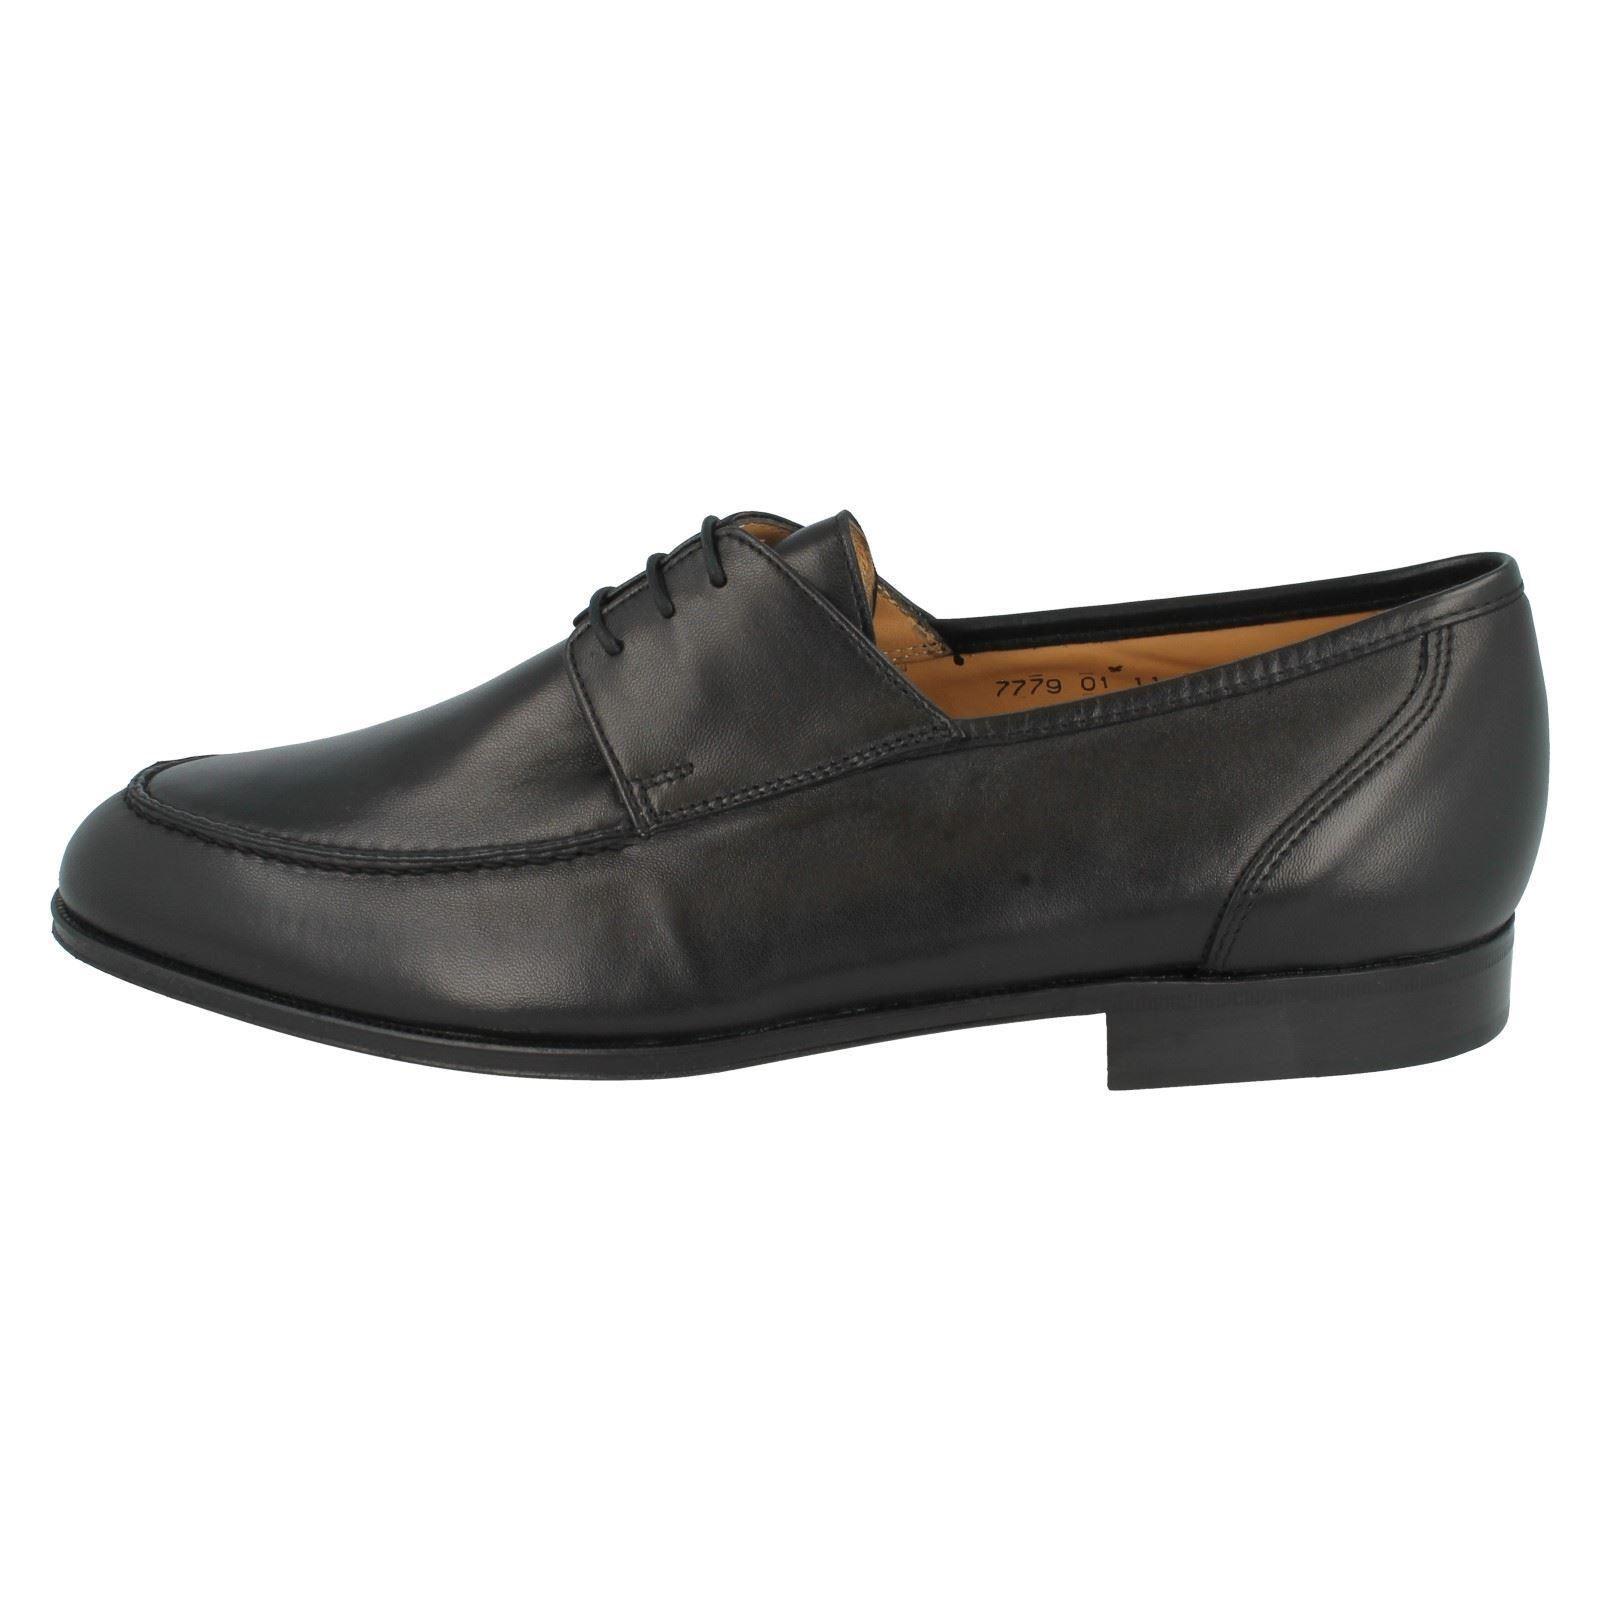 Mens FX fitting Verona schwarz leather lace up schuhe schuhe schuhe by Grenson ce5503